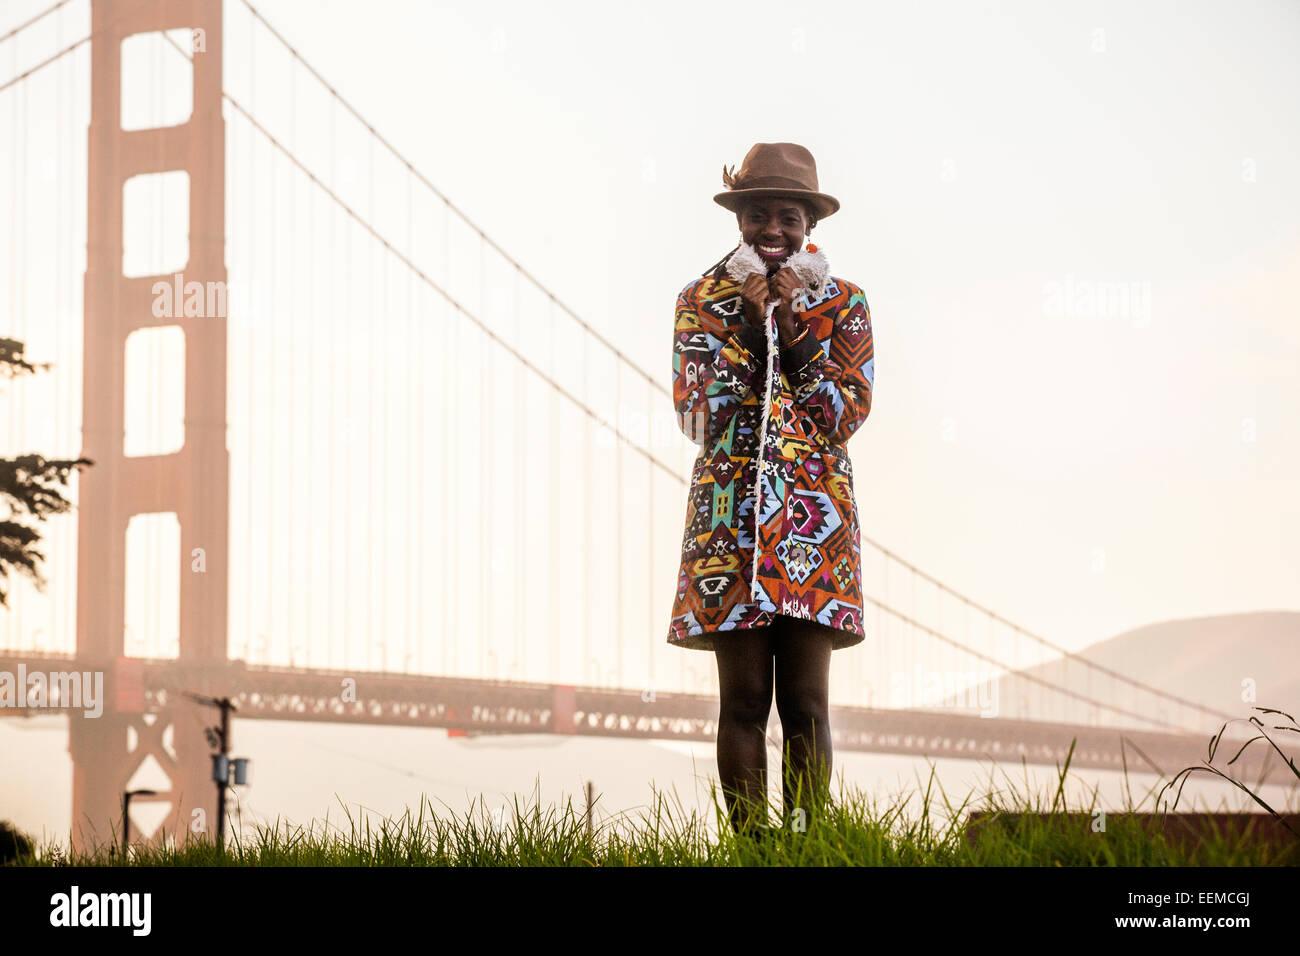 Black woman wearing colorful coat by Golden Gate Bridge, San Francisco, California, United States Stock Photo